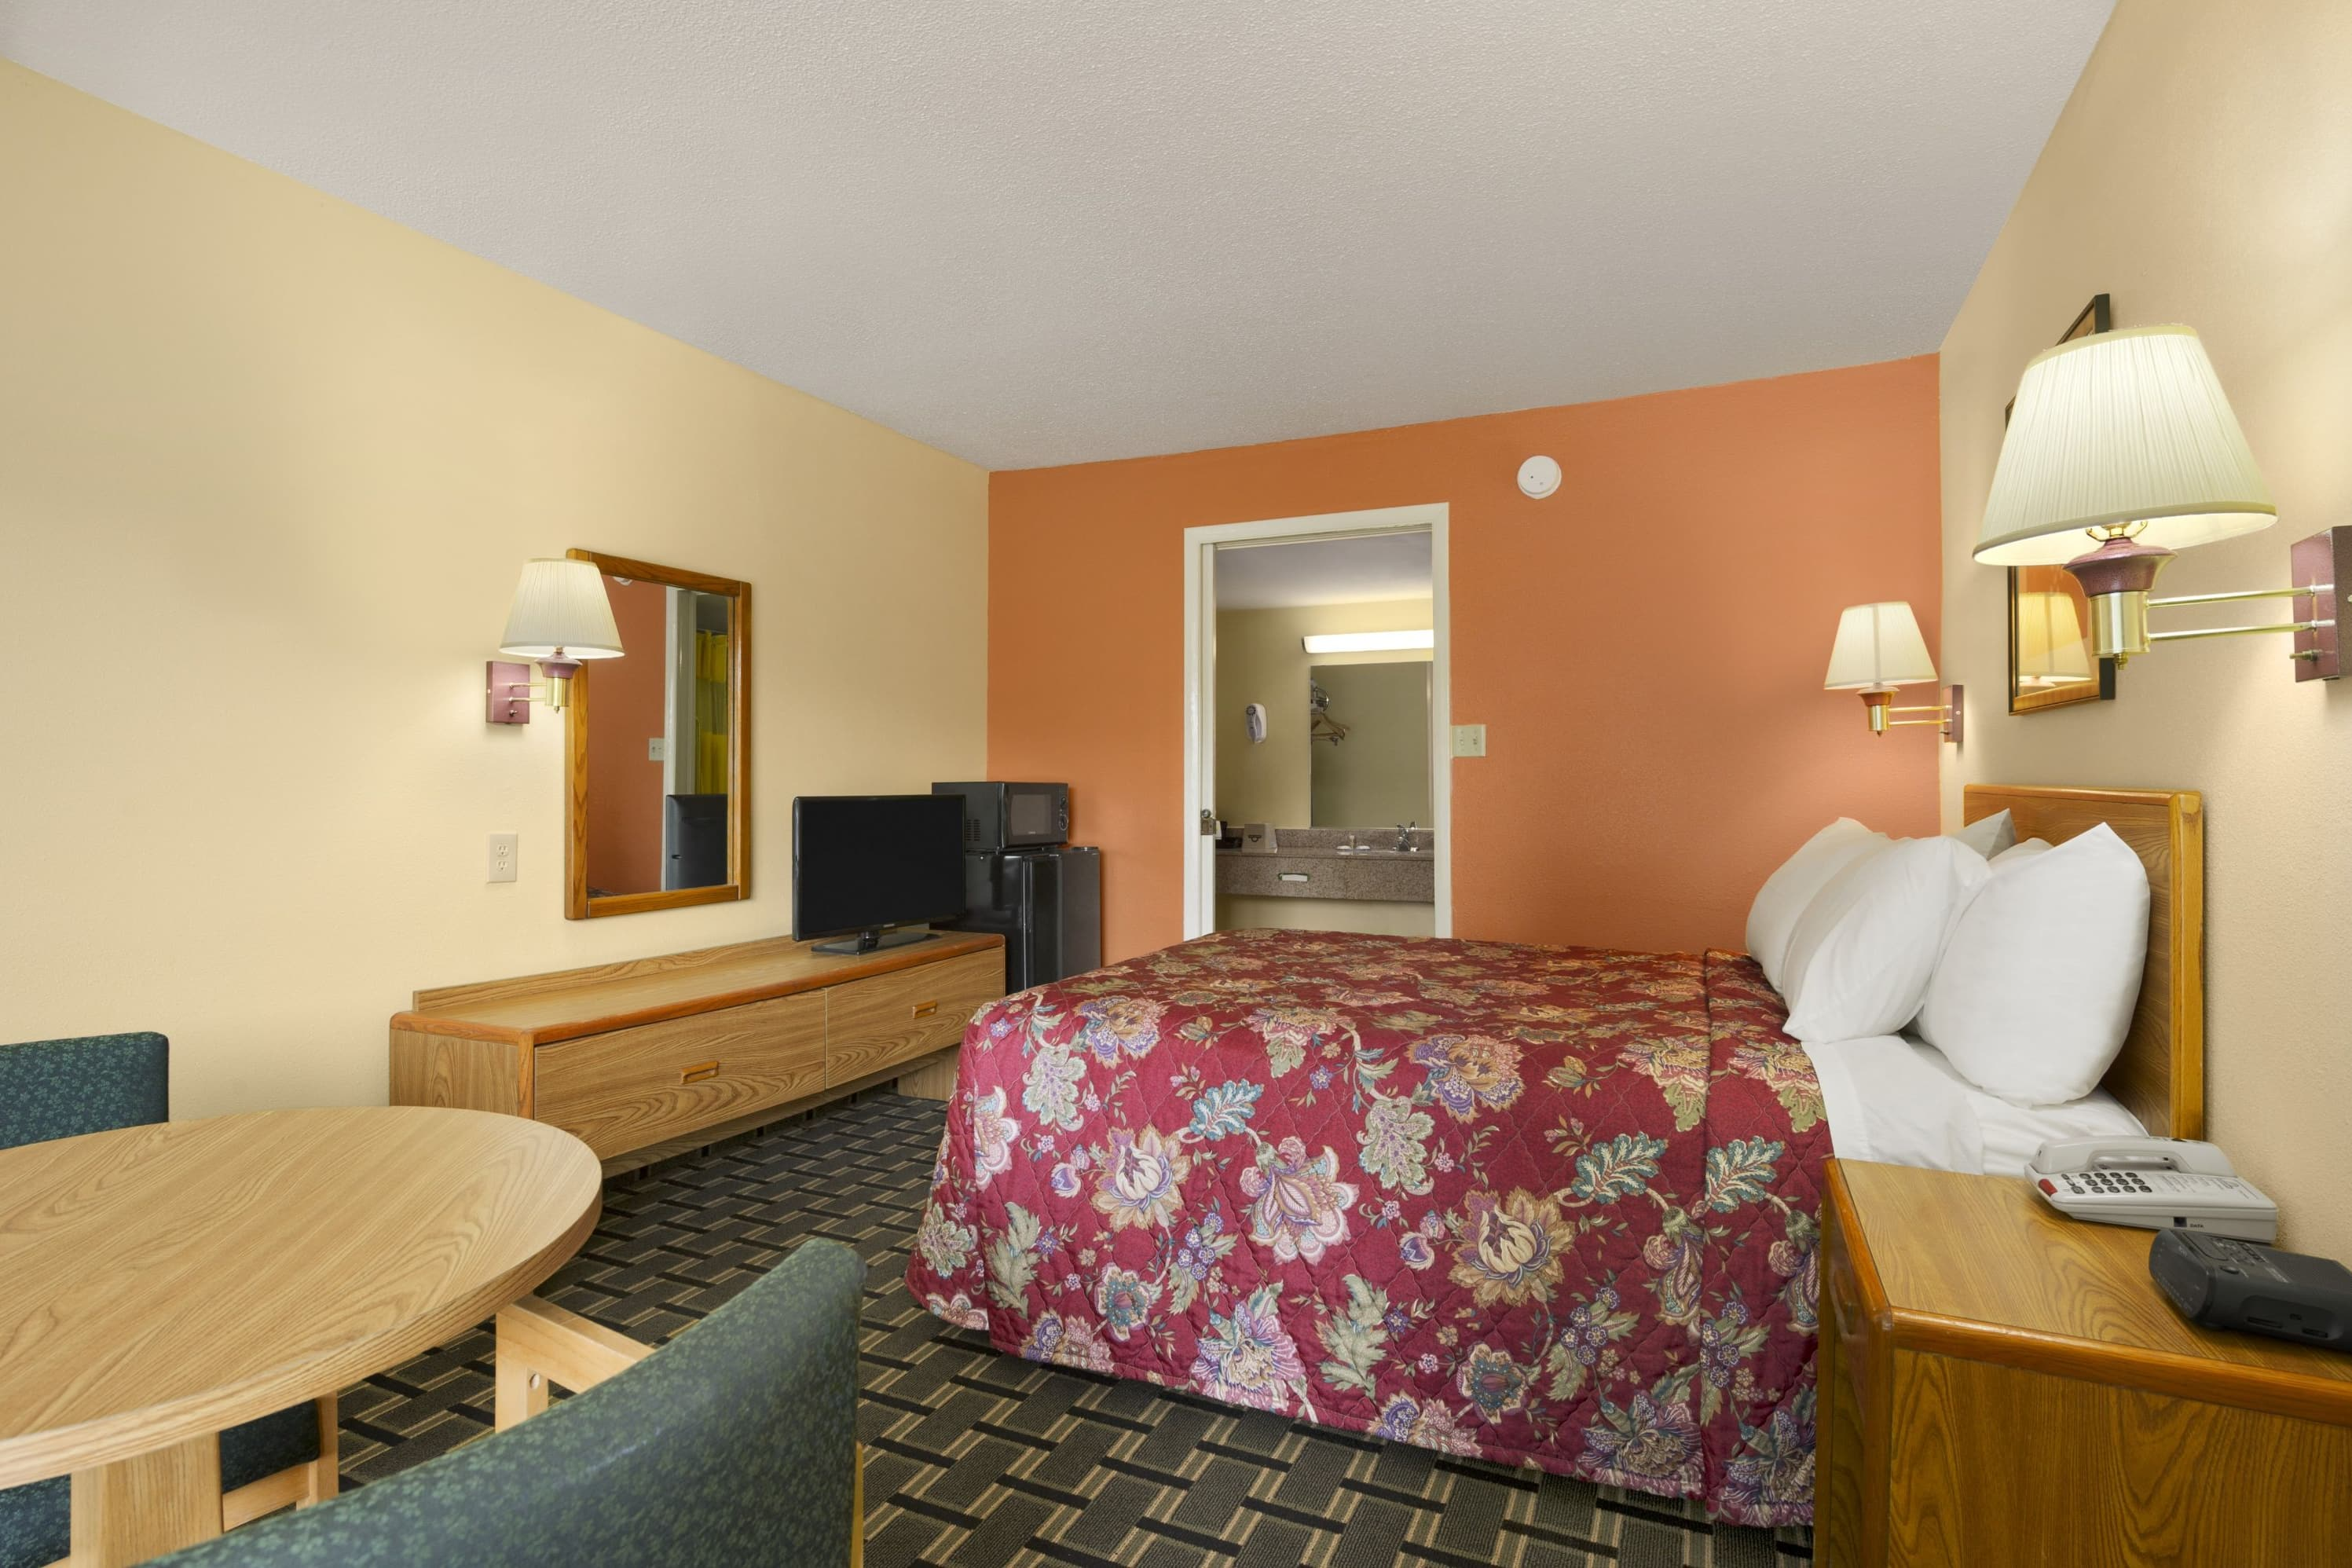 Days Inn Thomasville suite in Thomasville, Georgia